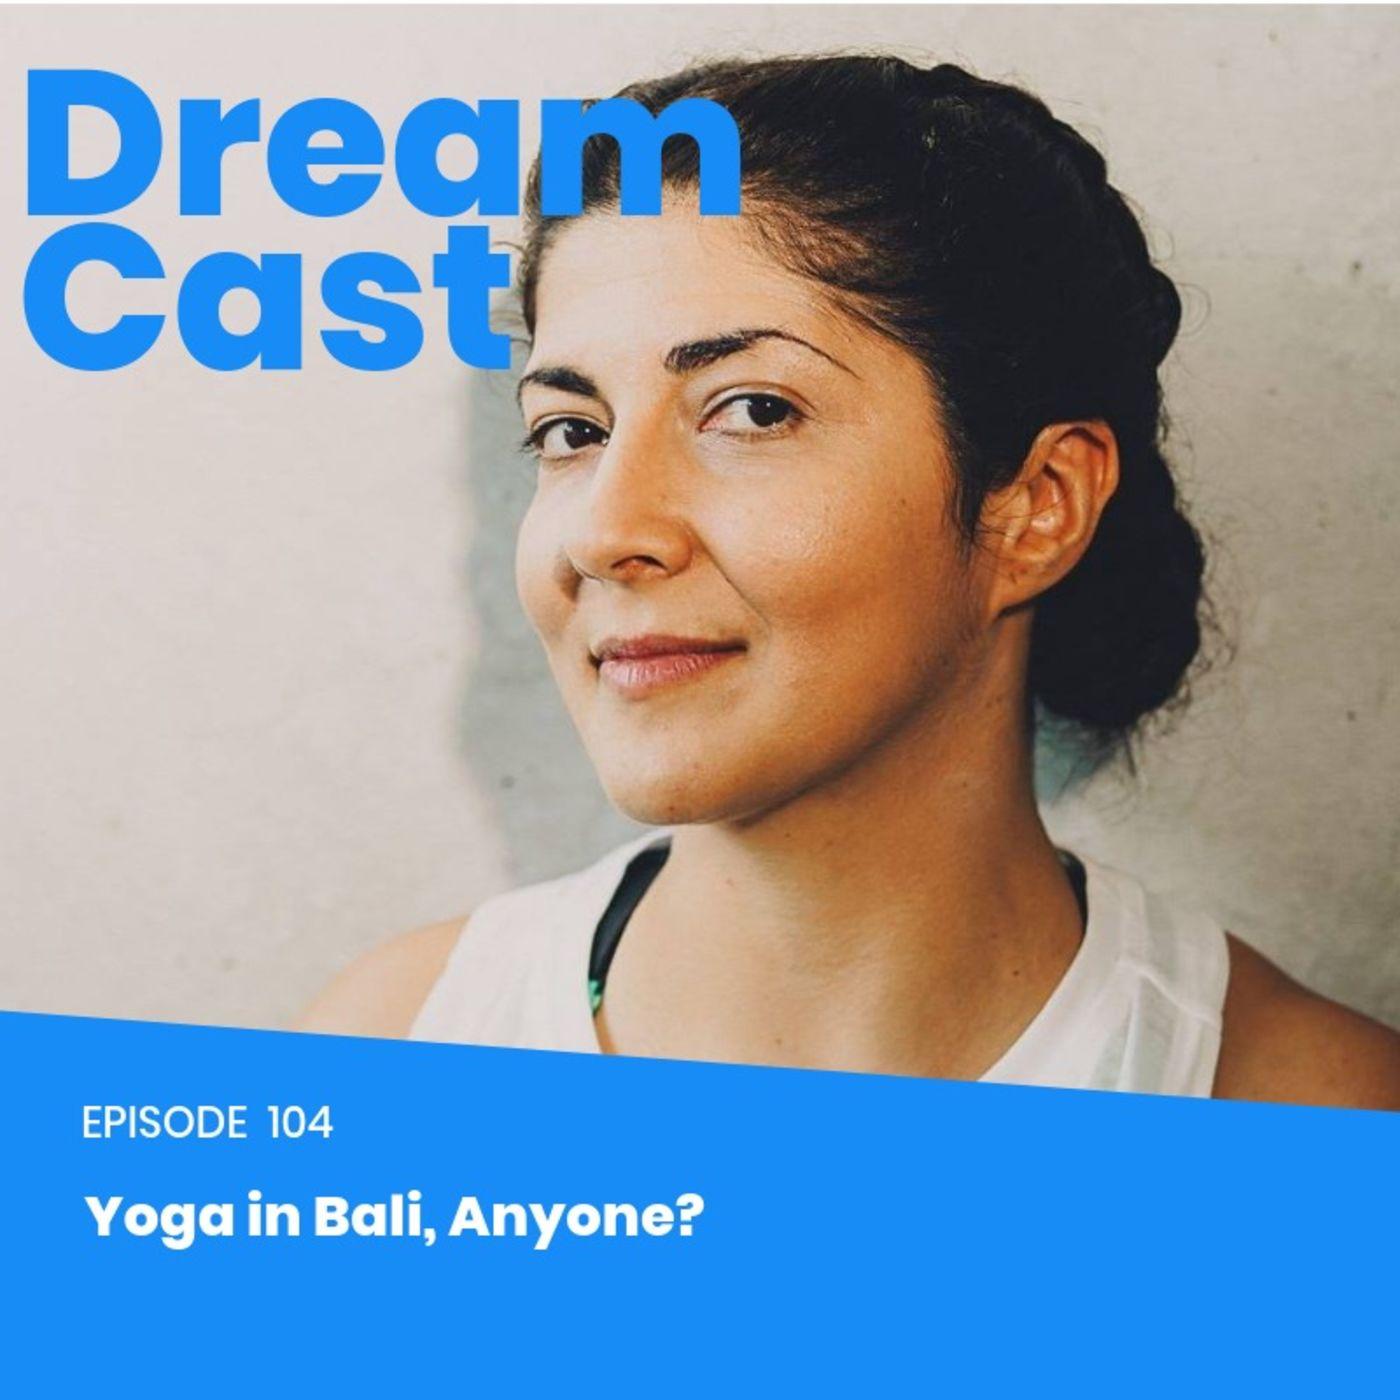 Episode 104 - Yoga in Bali, Anyone?